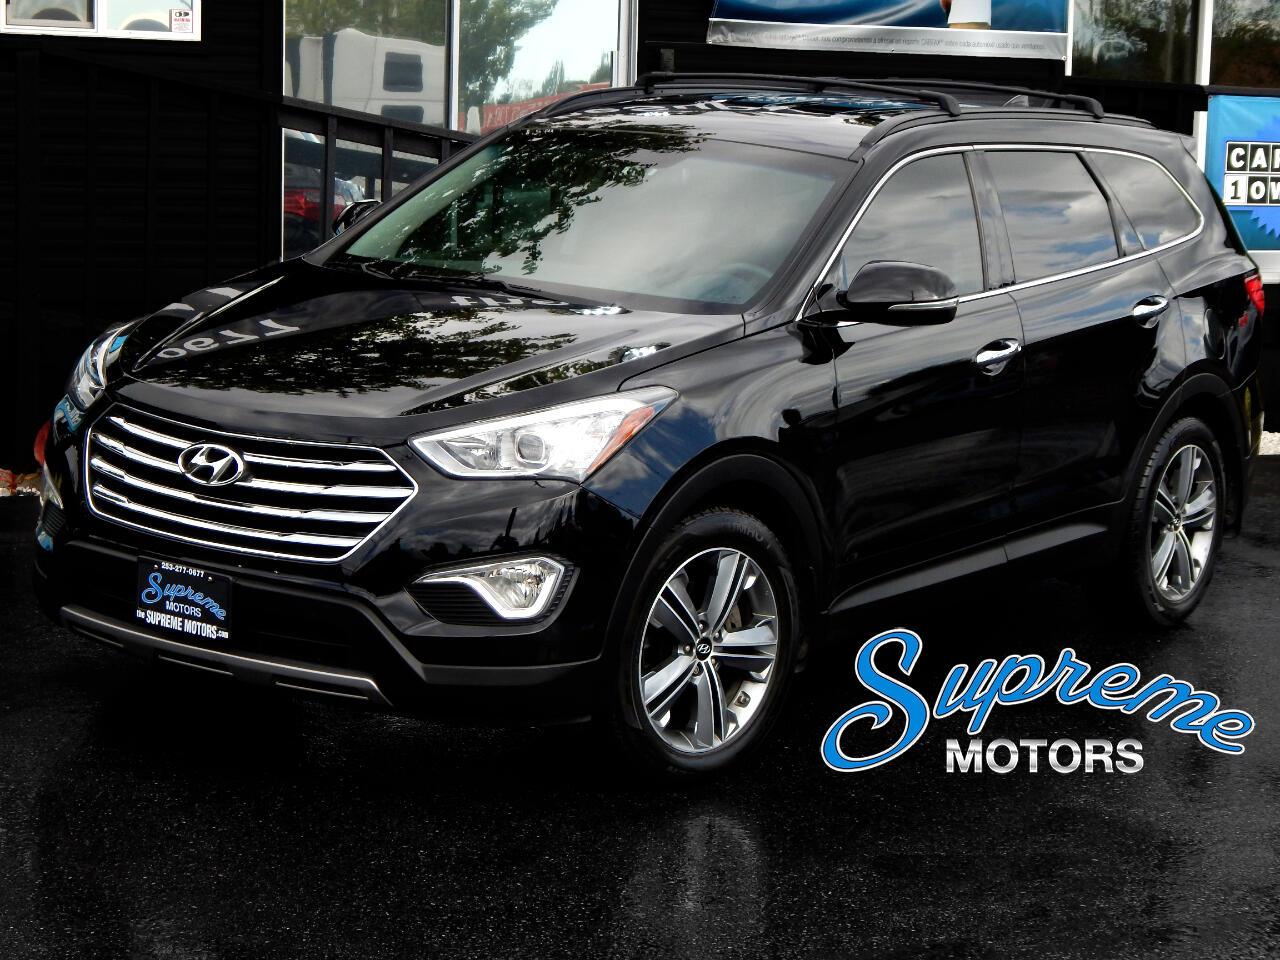 2016 Hyundai Santa Fe Limited AWD 3.3 Liter w/3rd Row Seat, Black Leathe